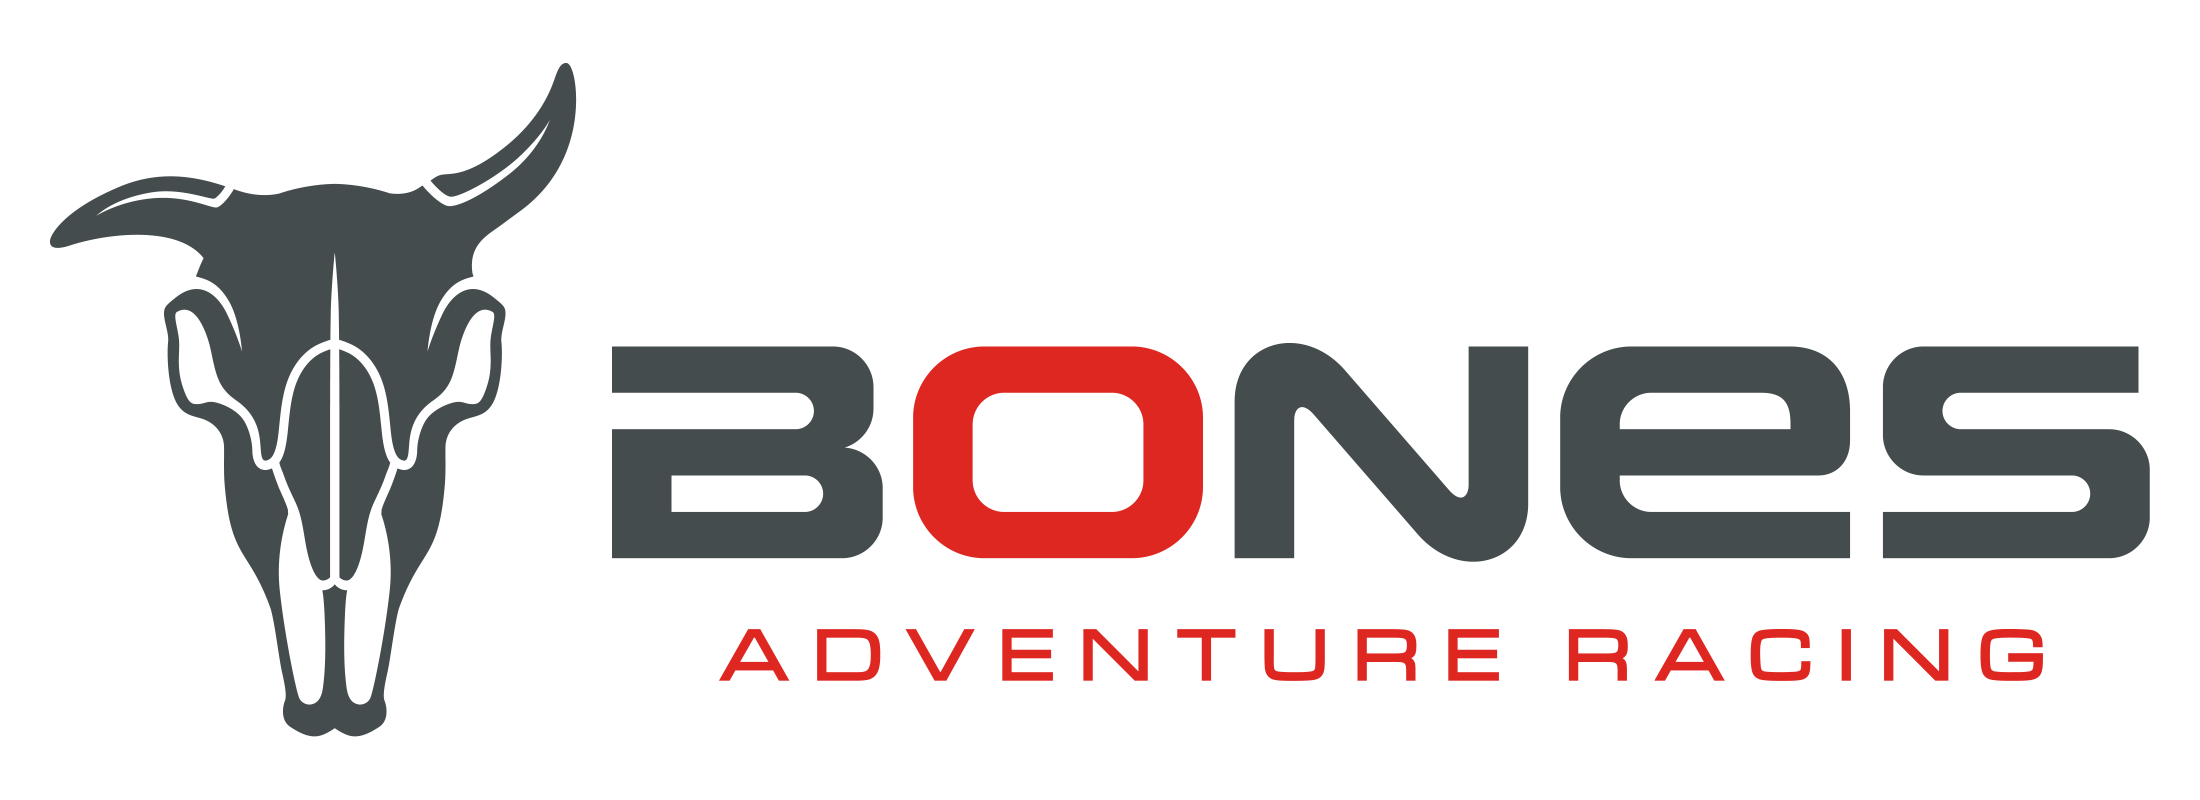 Bones adv racing_logo on left_on white (transparent).png